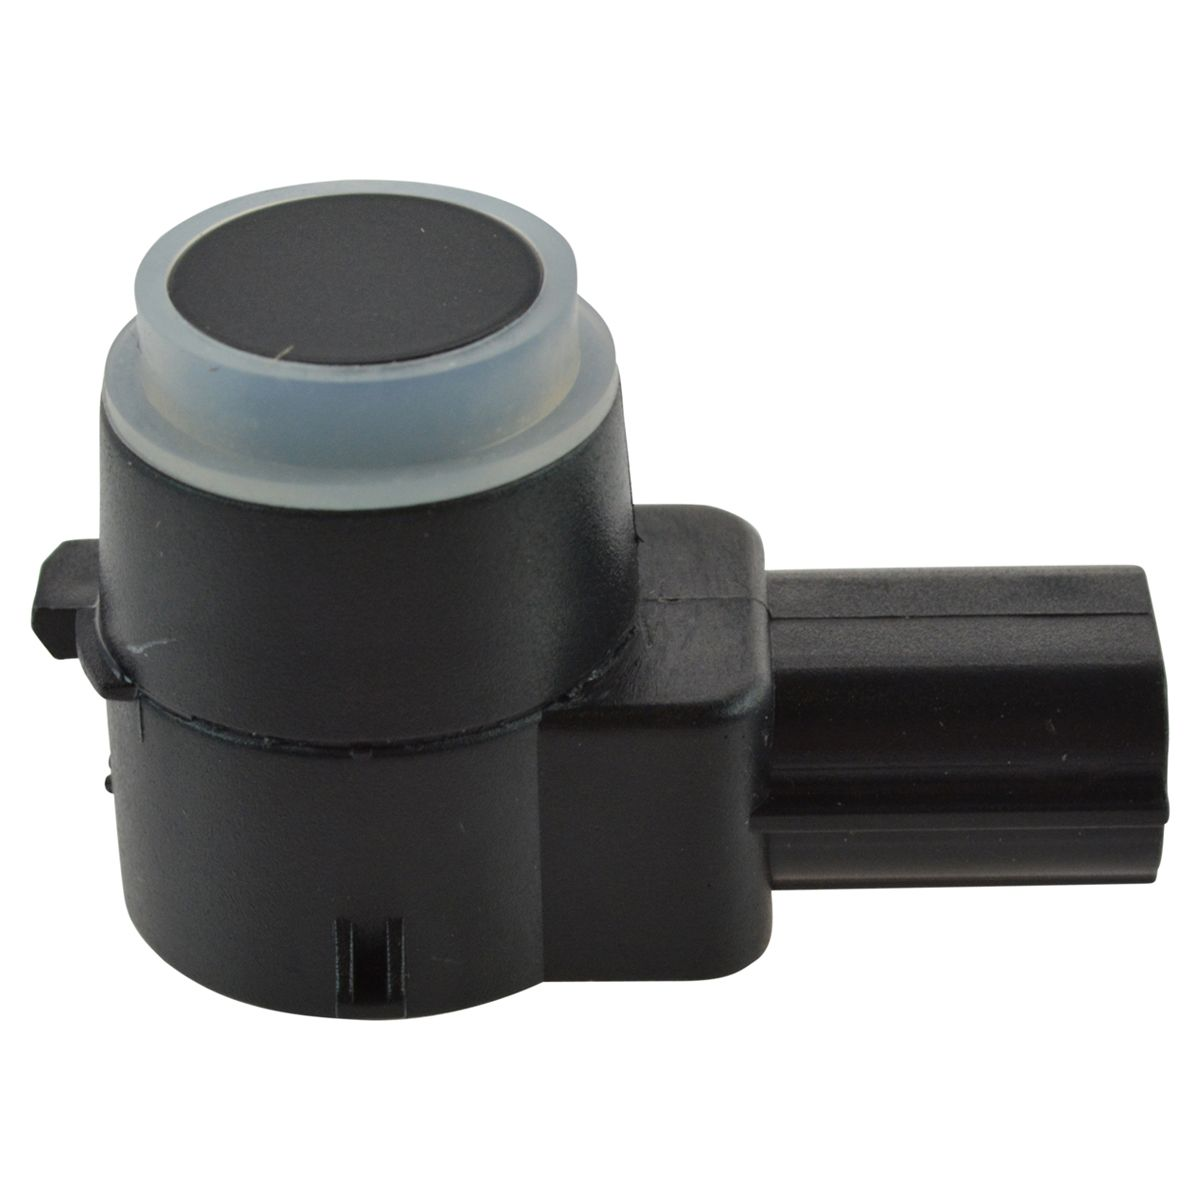 Autoly Parking Assist Sensor 3 Pin Car Backup Sensor for Dodge 1EW63TZZAA